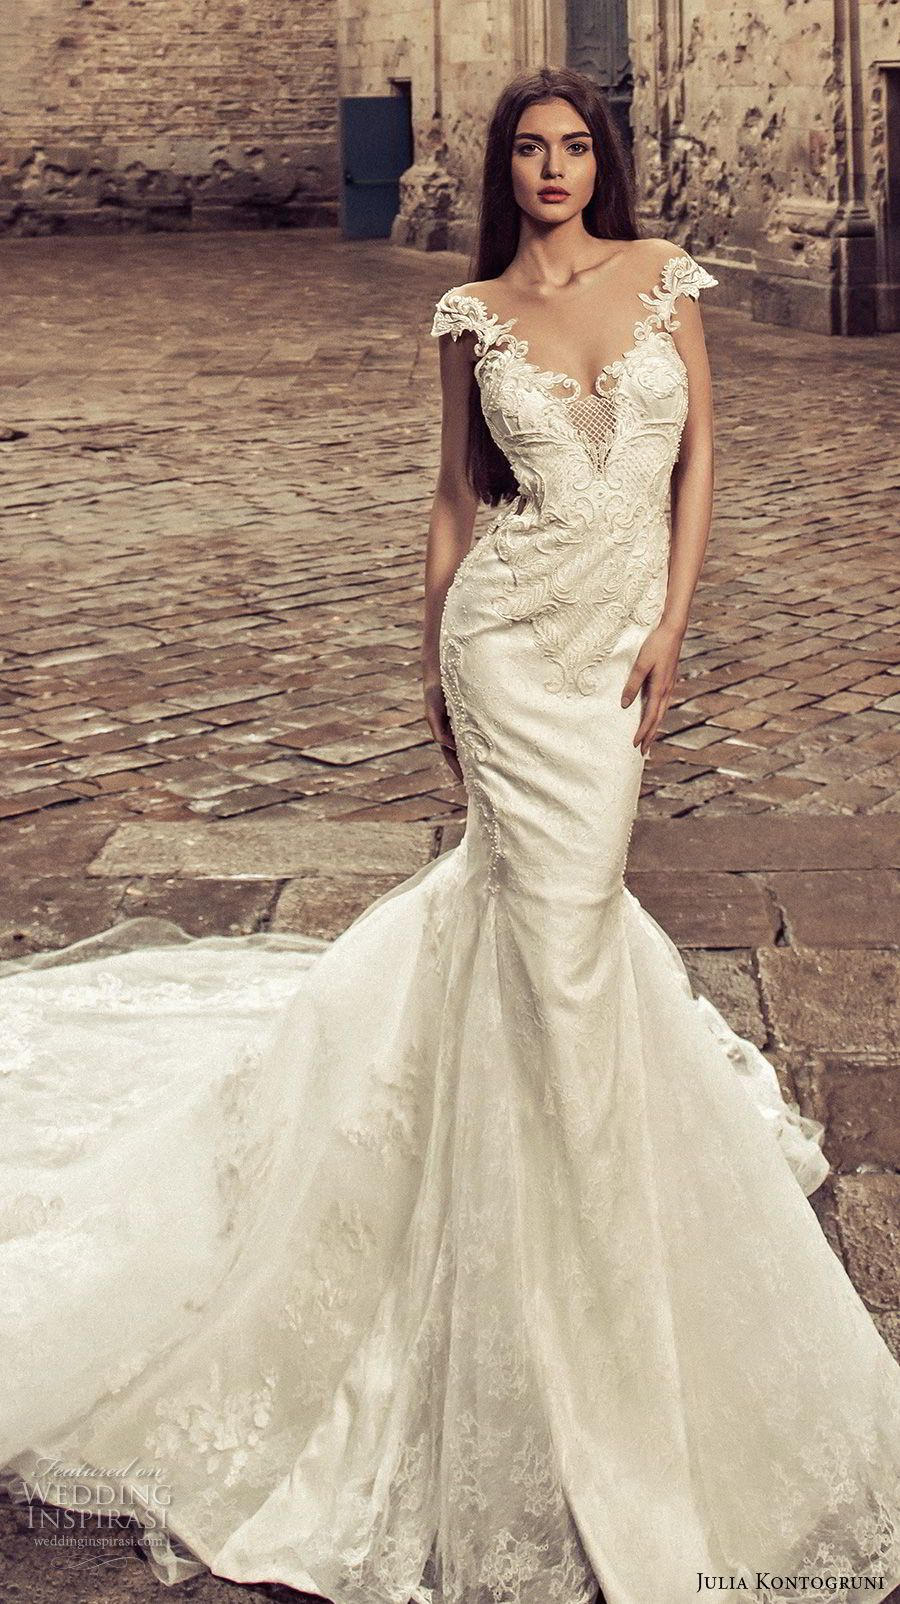 Lace wedding dress with cap sleeves sweetheart neckline  Julia Kontogruni  Wedding Dresses u ucBarcelonaud Bridal